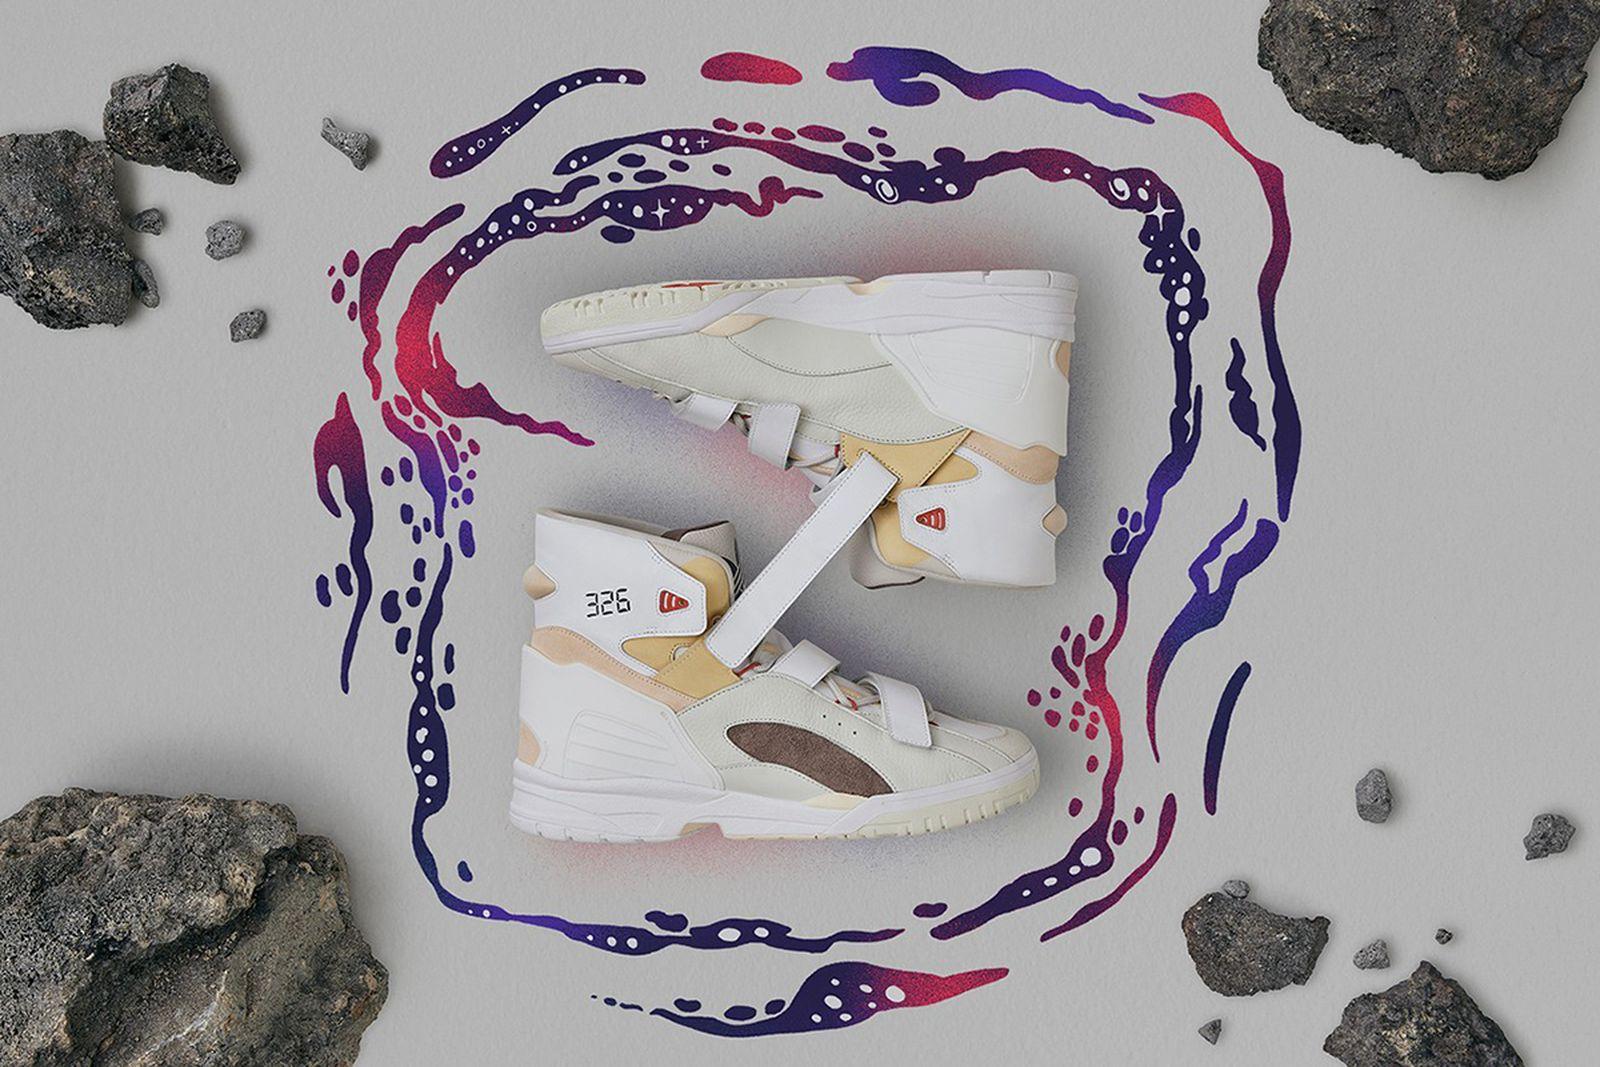 kid-cudi-adidas-vadawam-326-release-date-price-09